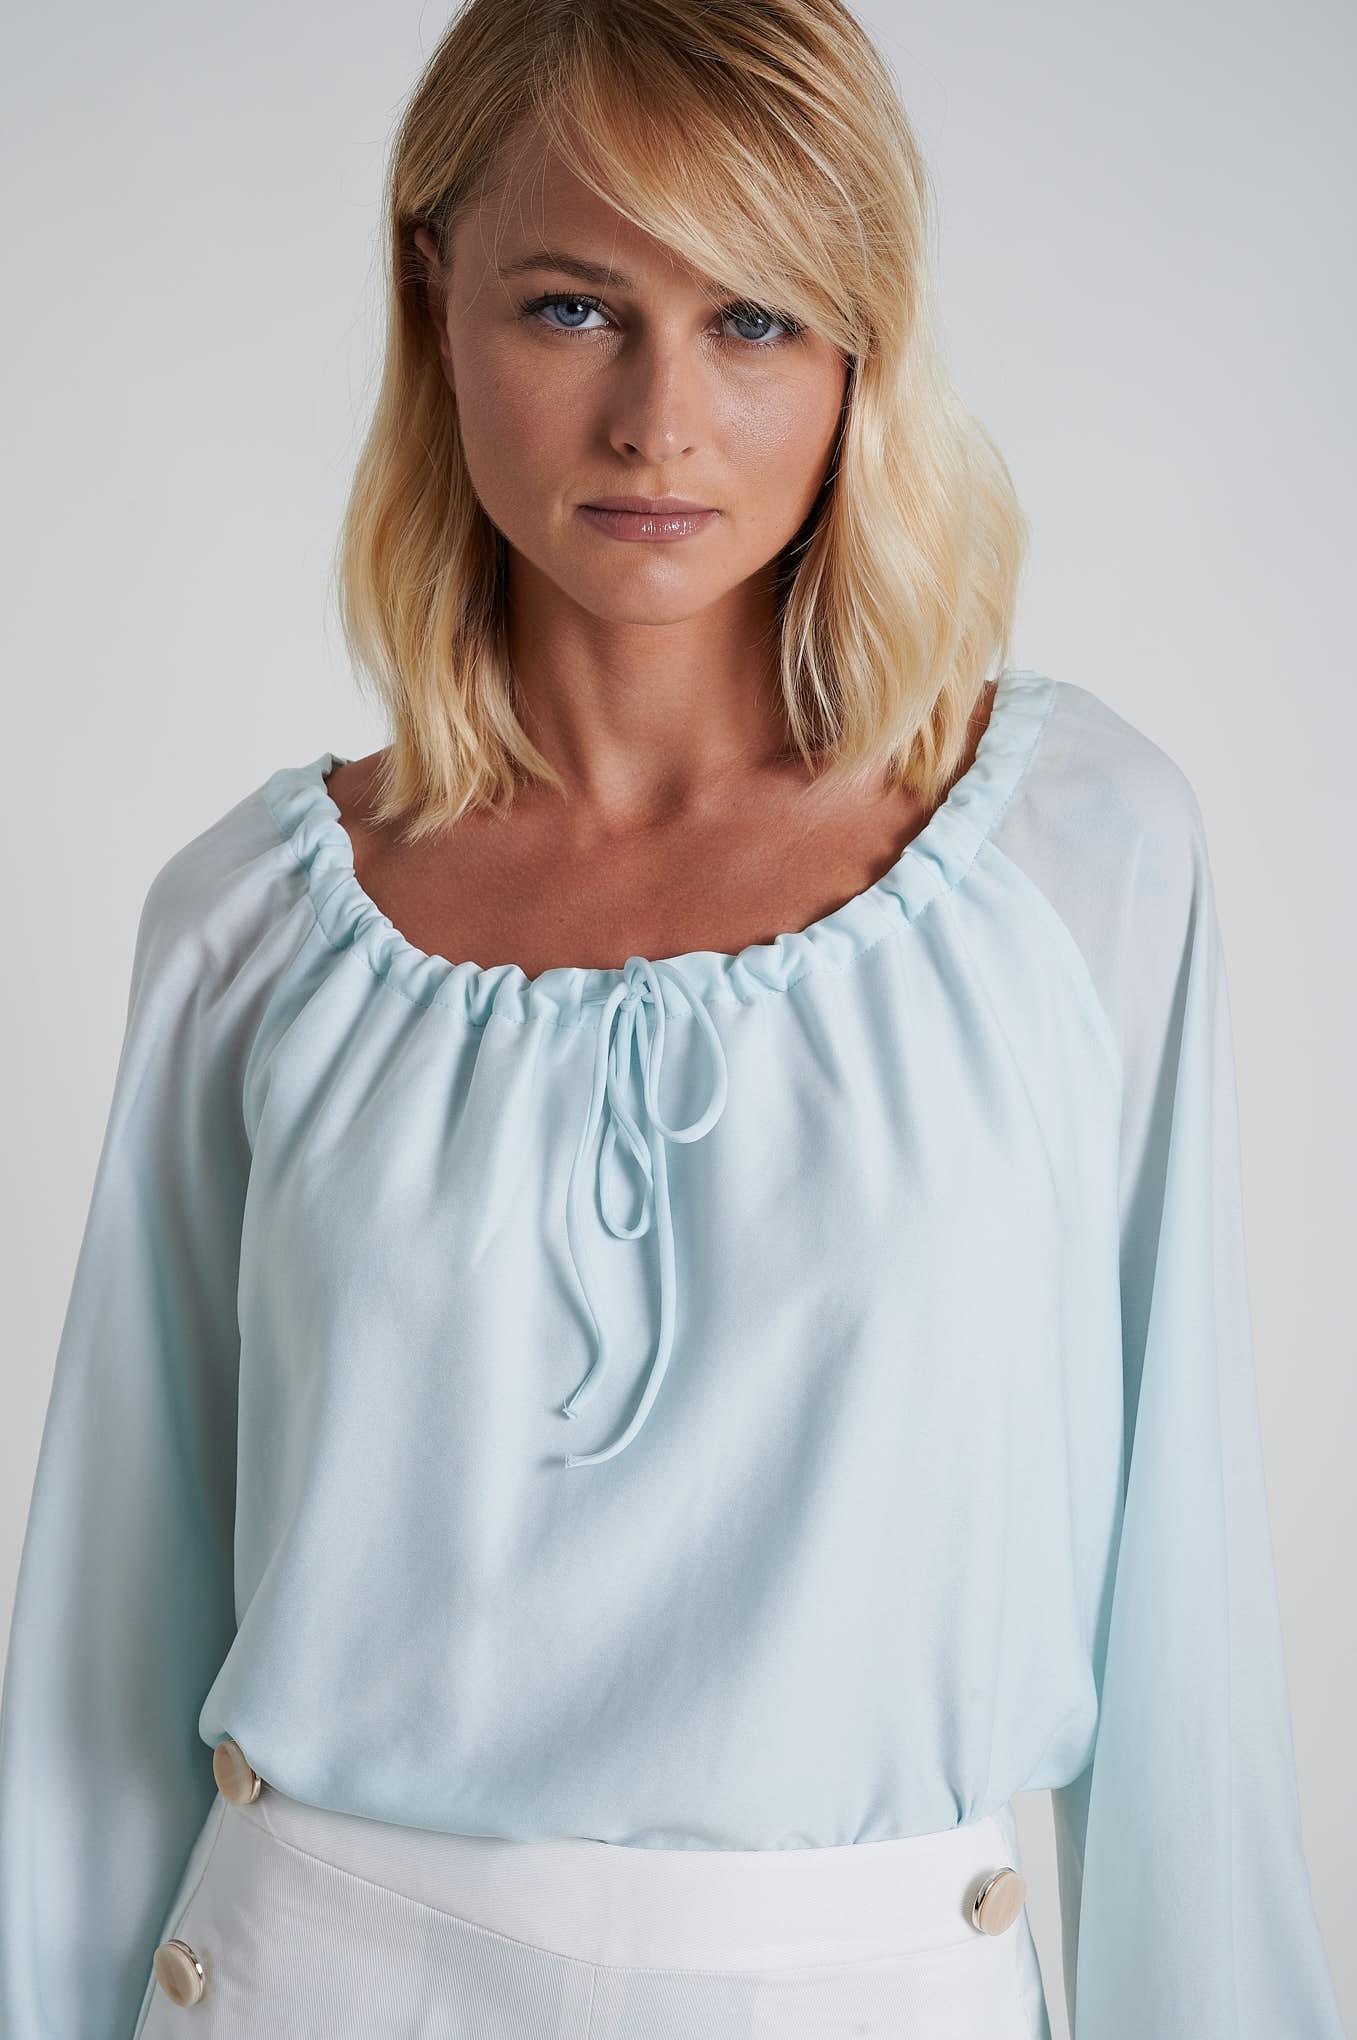 Blouse Turquoise Fantasy Woman